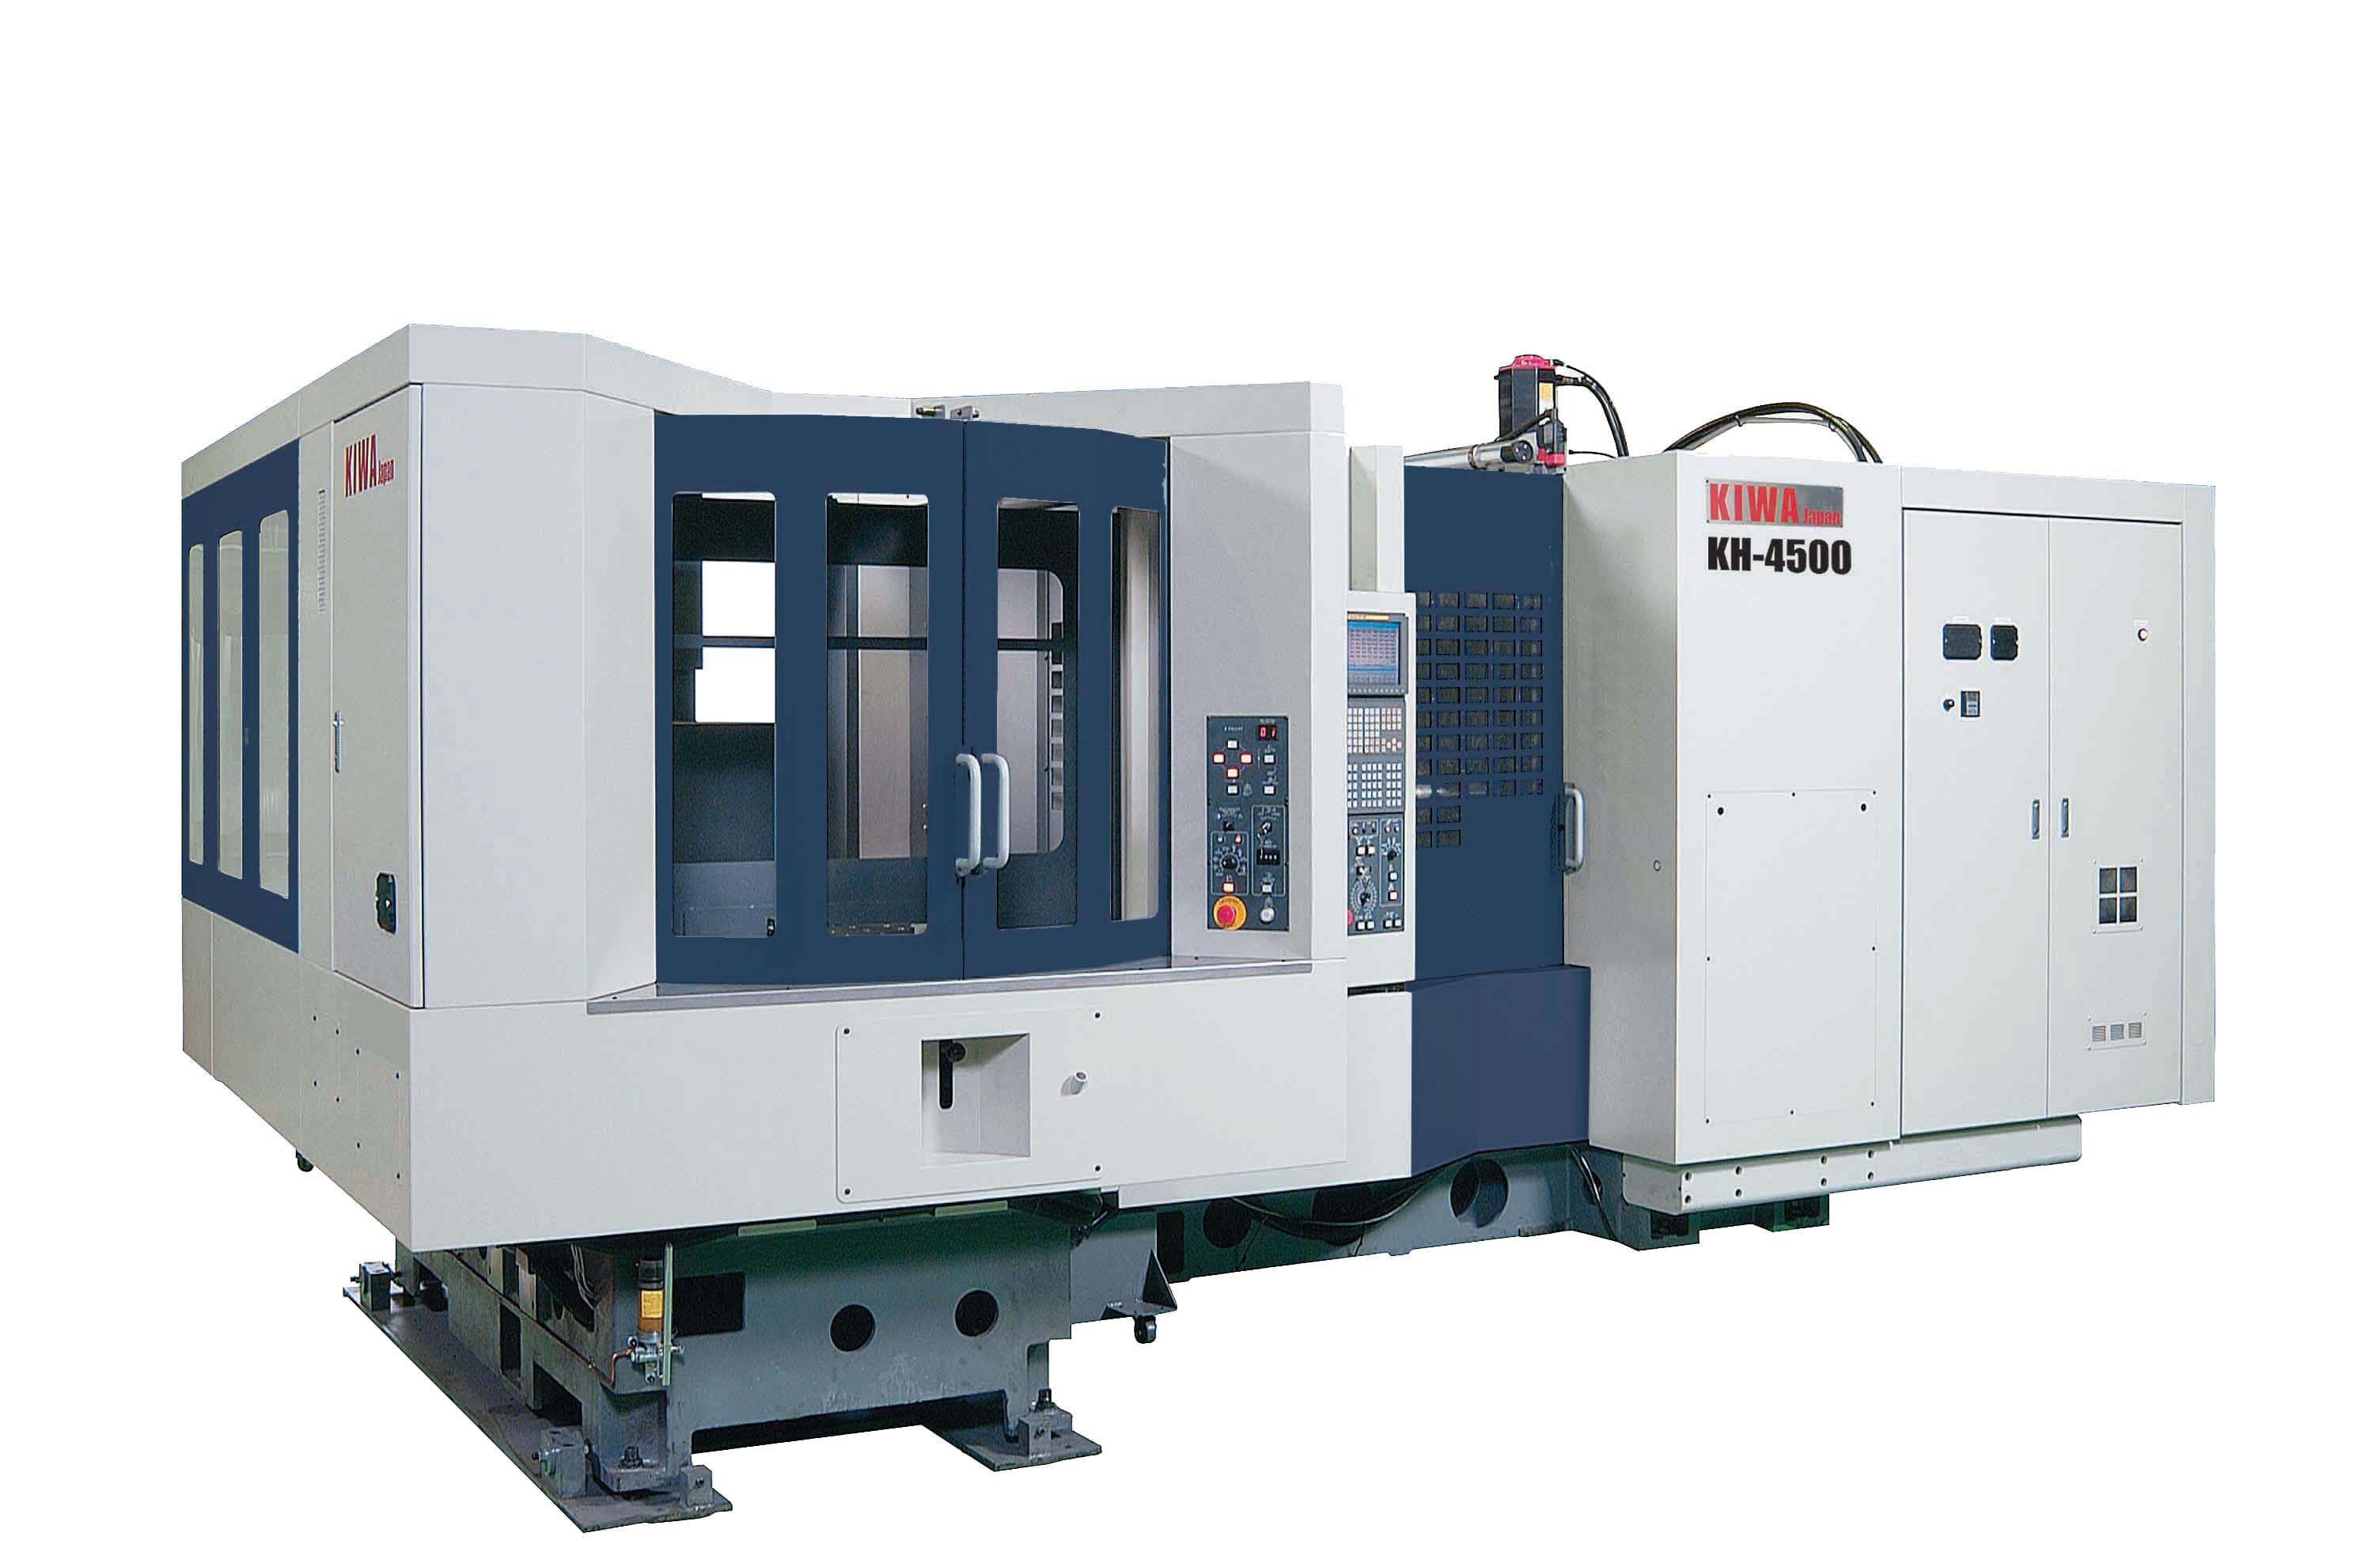 Large horizontal mill machine, the KIWA KH-4500